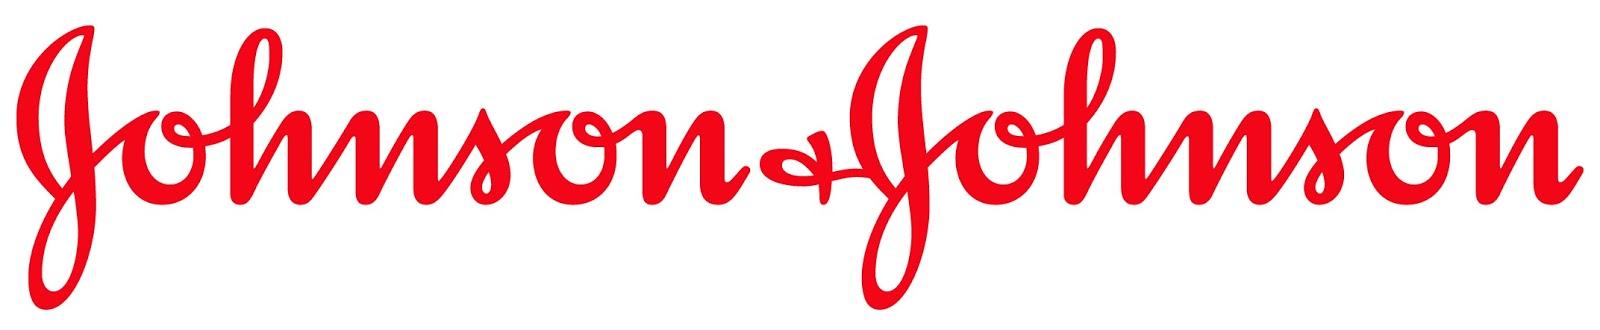 Johnson & Johnson USA Headquarters Contact Address ~ New Customer